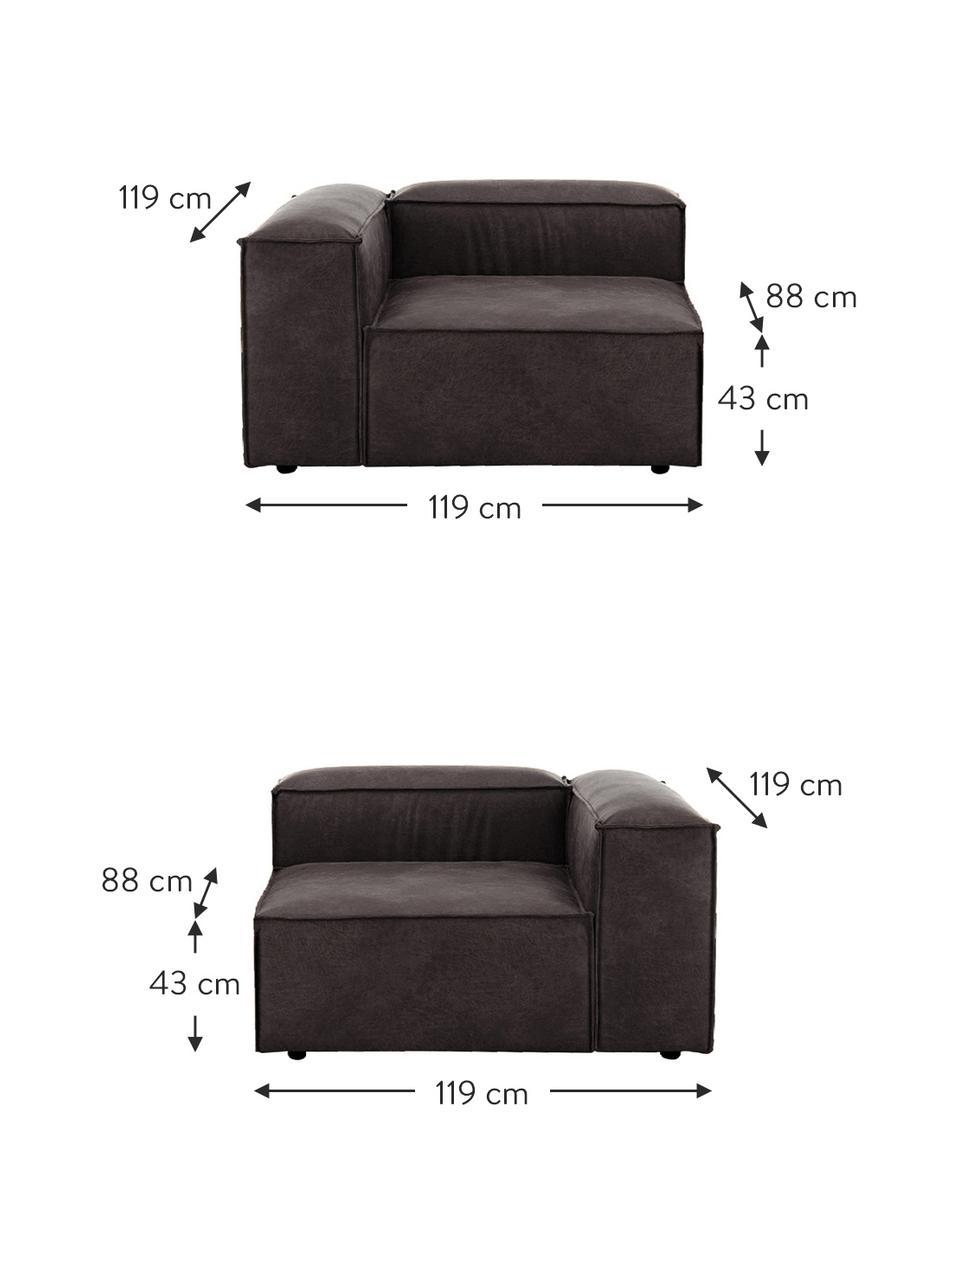 Modulares Sofa Lennon (3-Sitzer) in Braungrau aus recyceltem Leder, Bezug: Recyceltes Leder (70% Led, Gestell: Massives Kiefernholz, Spe, Füße: Kunststoff Die Füße befin, Leder Braungrau, B 238 x T 119 cm